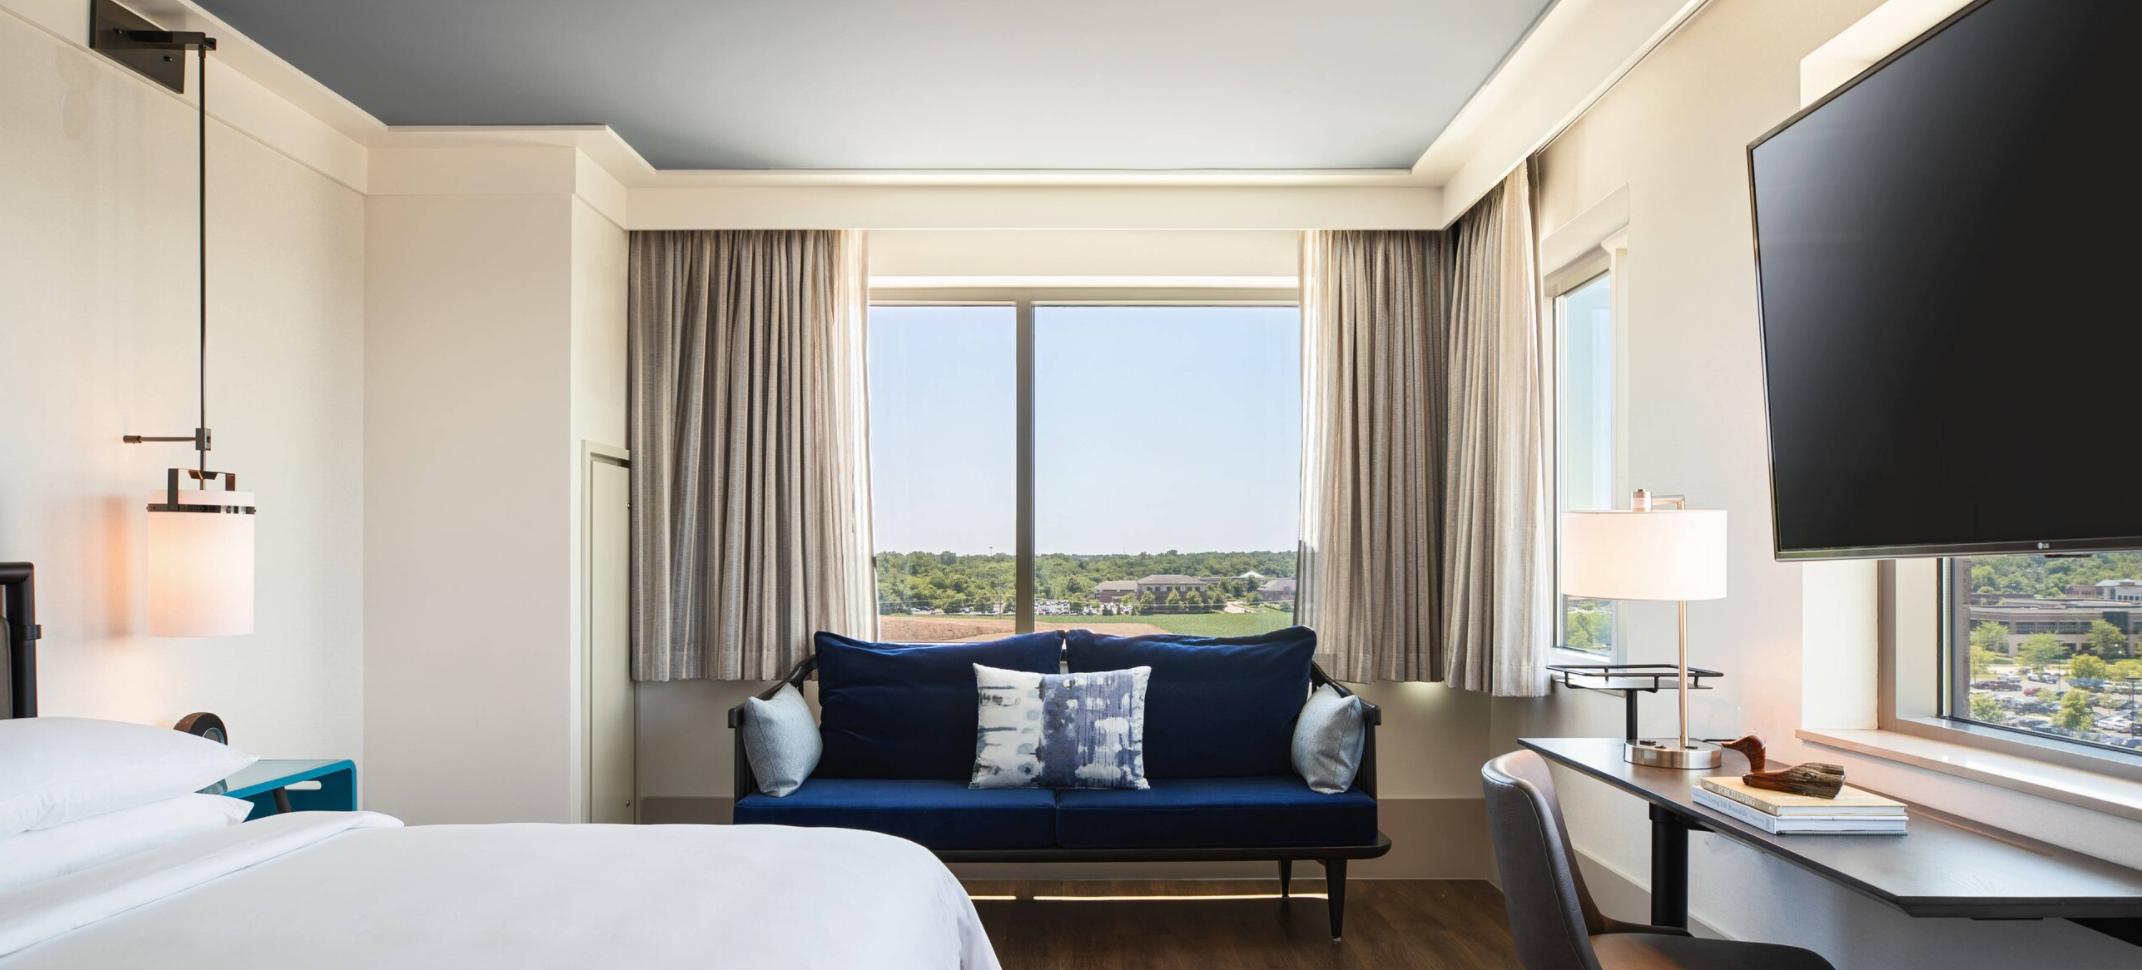 https://www.hotelsbyday.com/_data/default-hotel_image/3/18537/screenshot-2020-06-12-at-5-31-38-pm.png